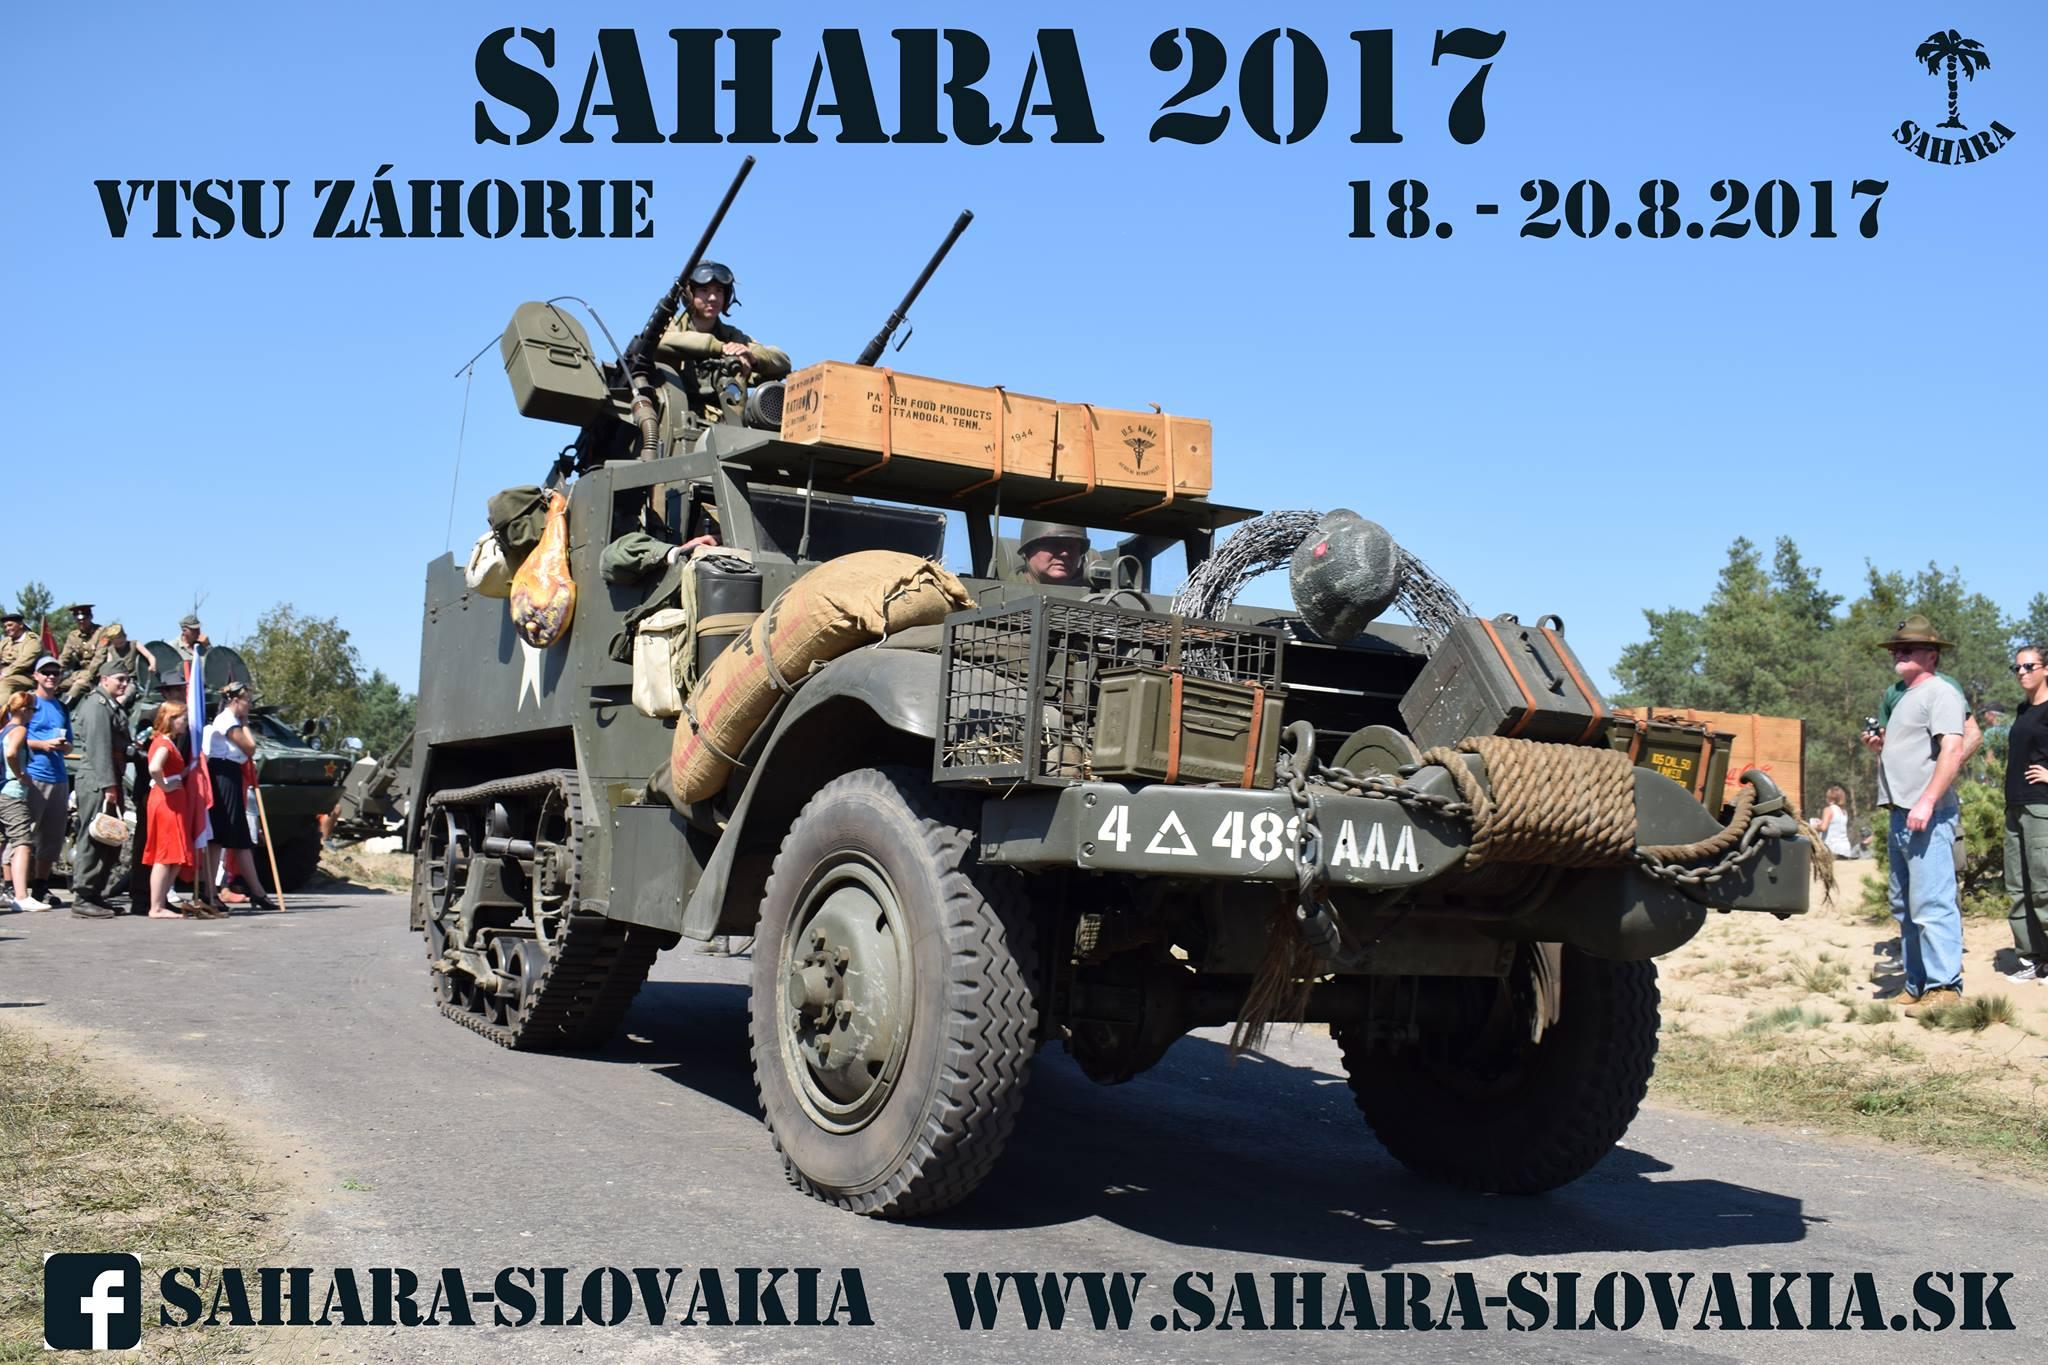 www.1866.cz/images/akce_2017/sahara2017.jpg